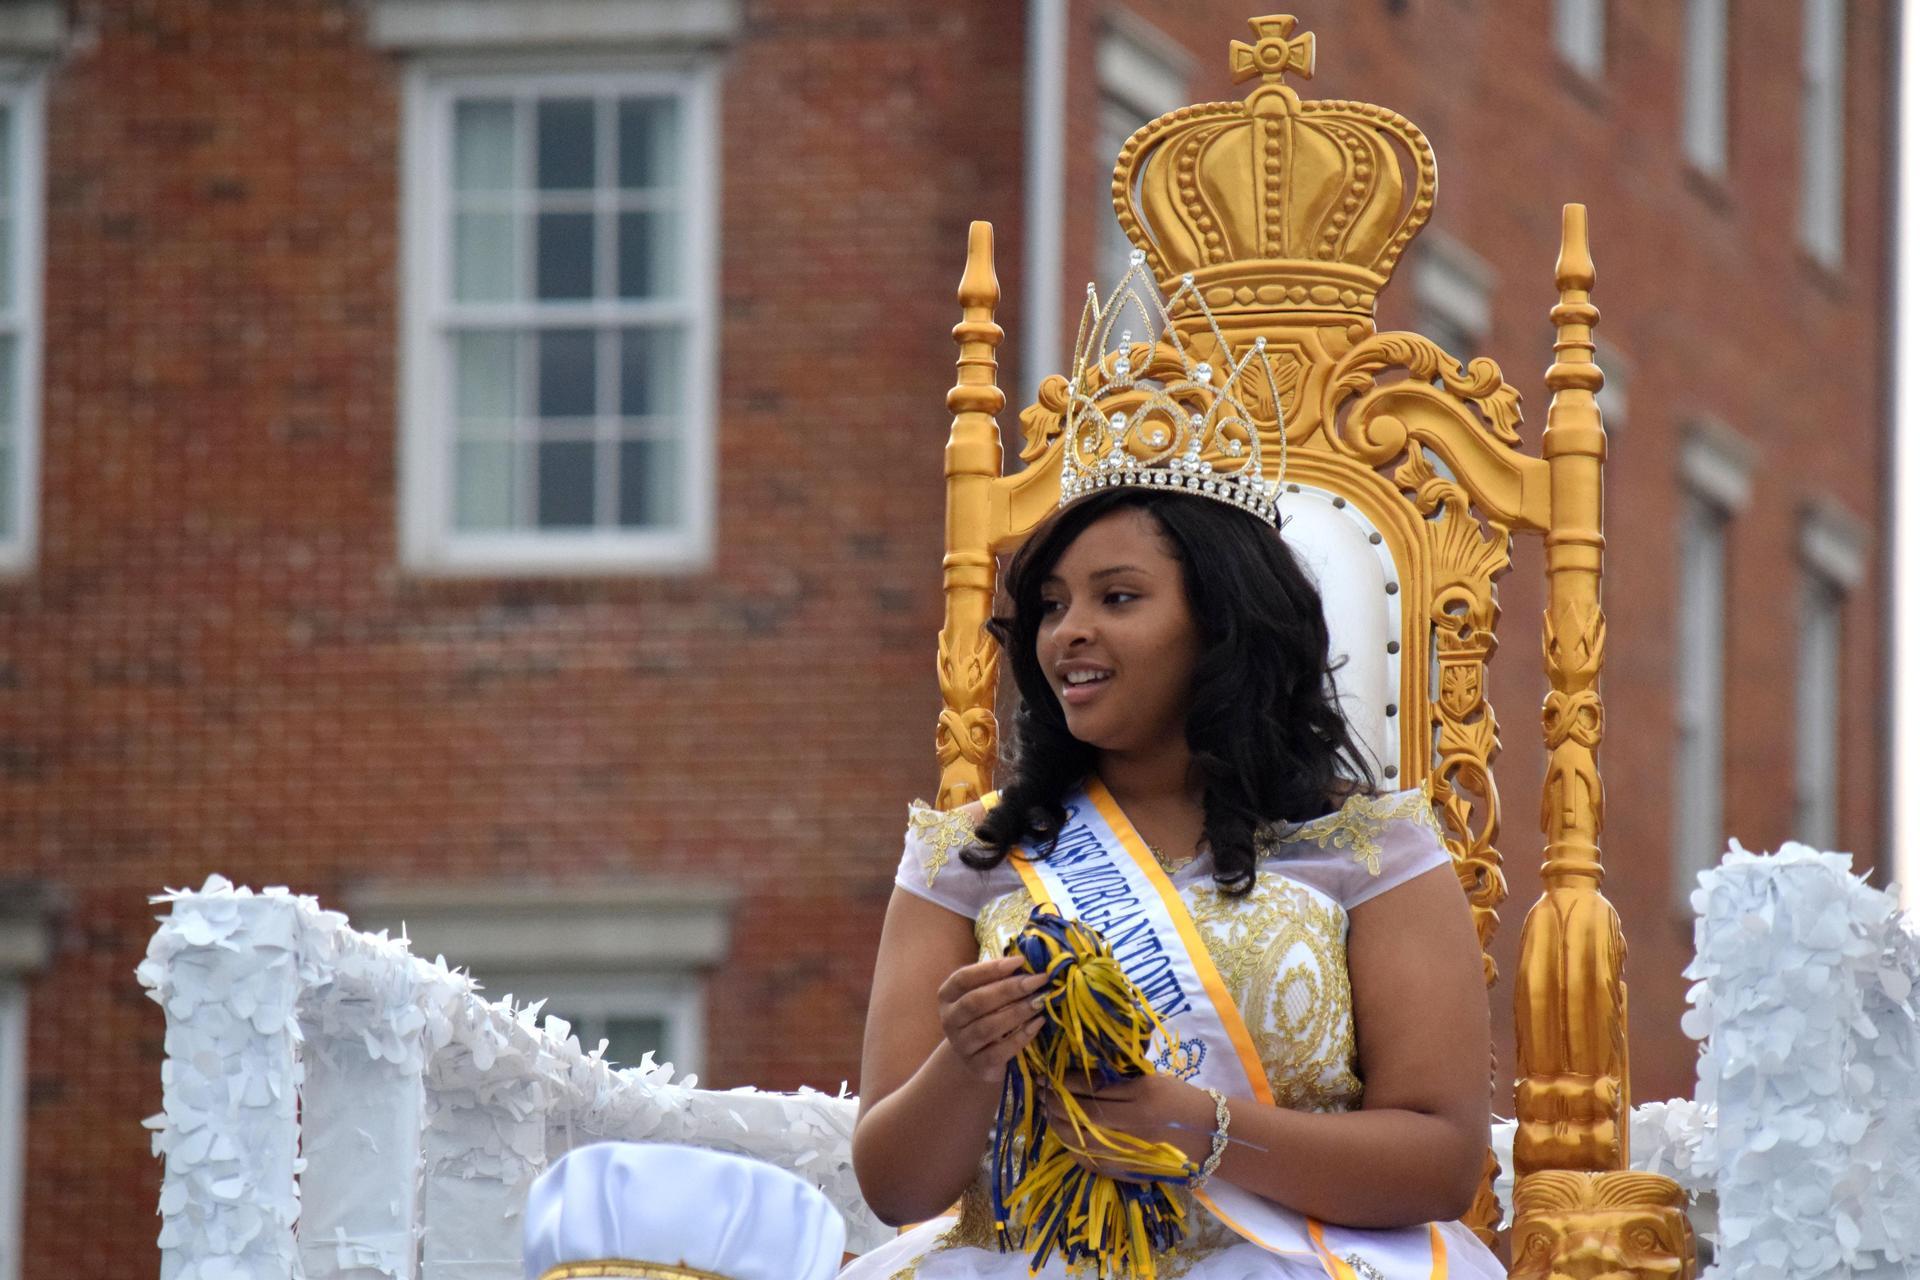 Miss Morgantown 2019-2020